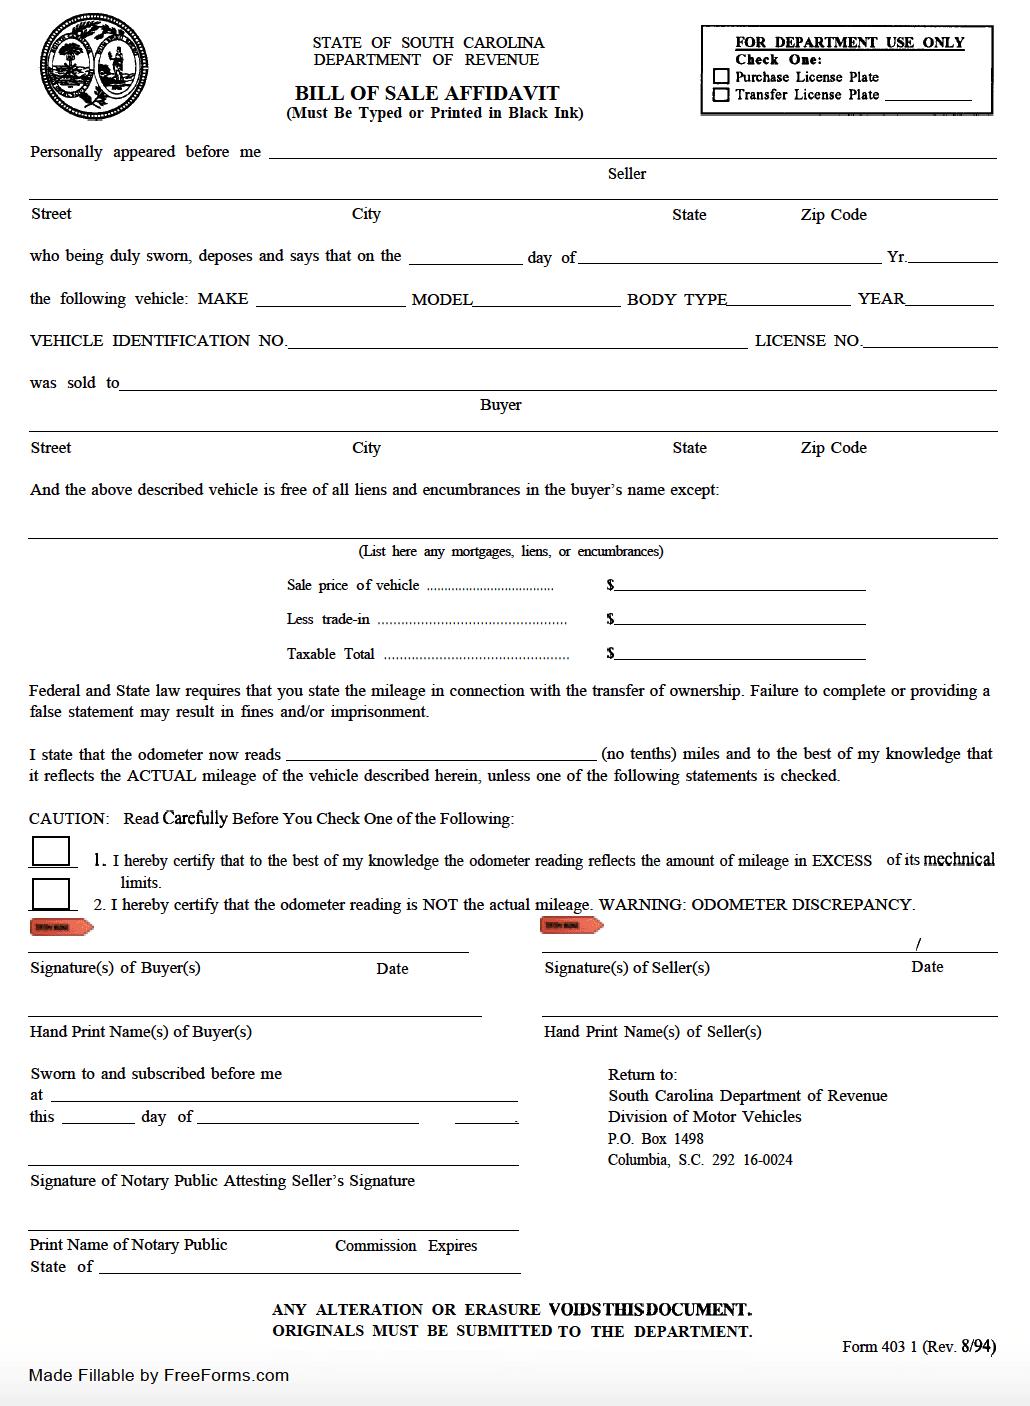 Free South Carolina Motor Vehicle Dmv Bill Of Sale Form Pdf